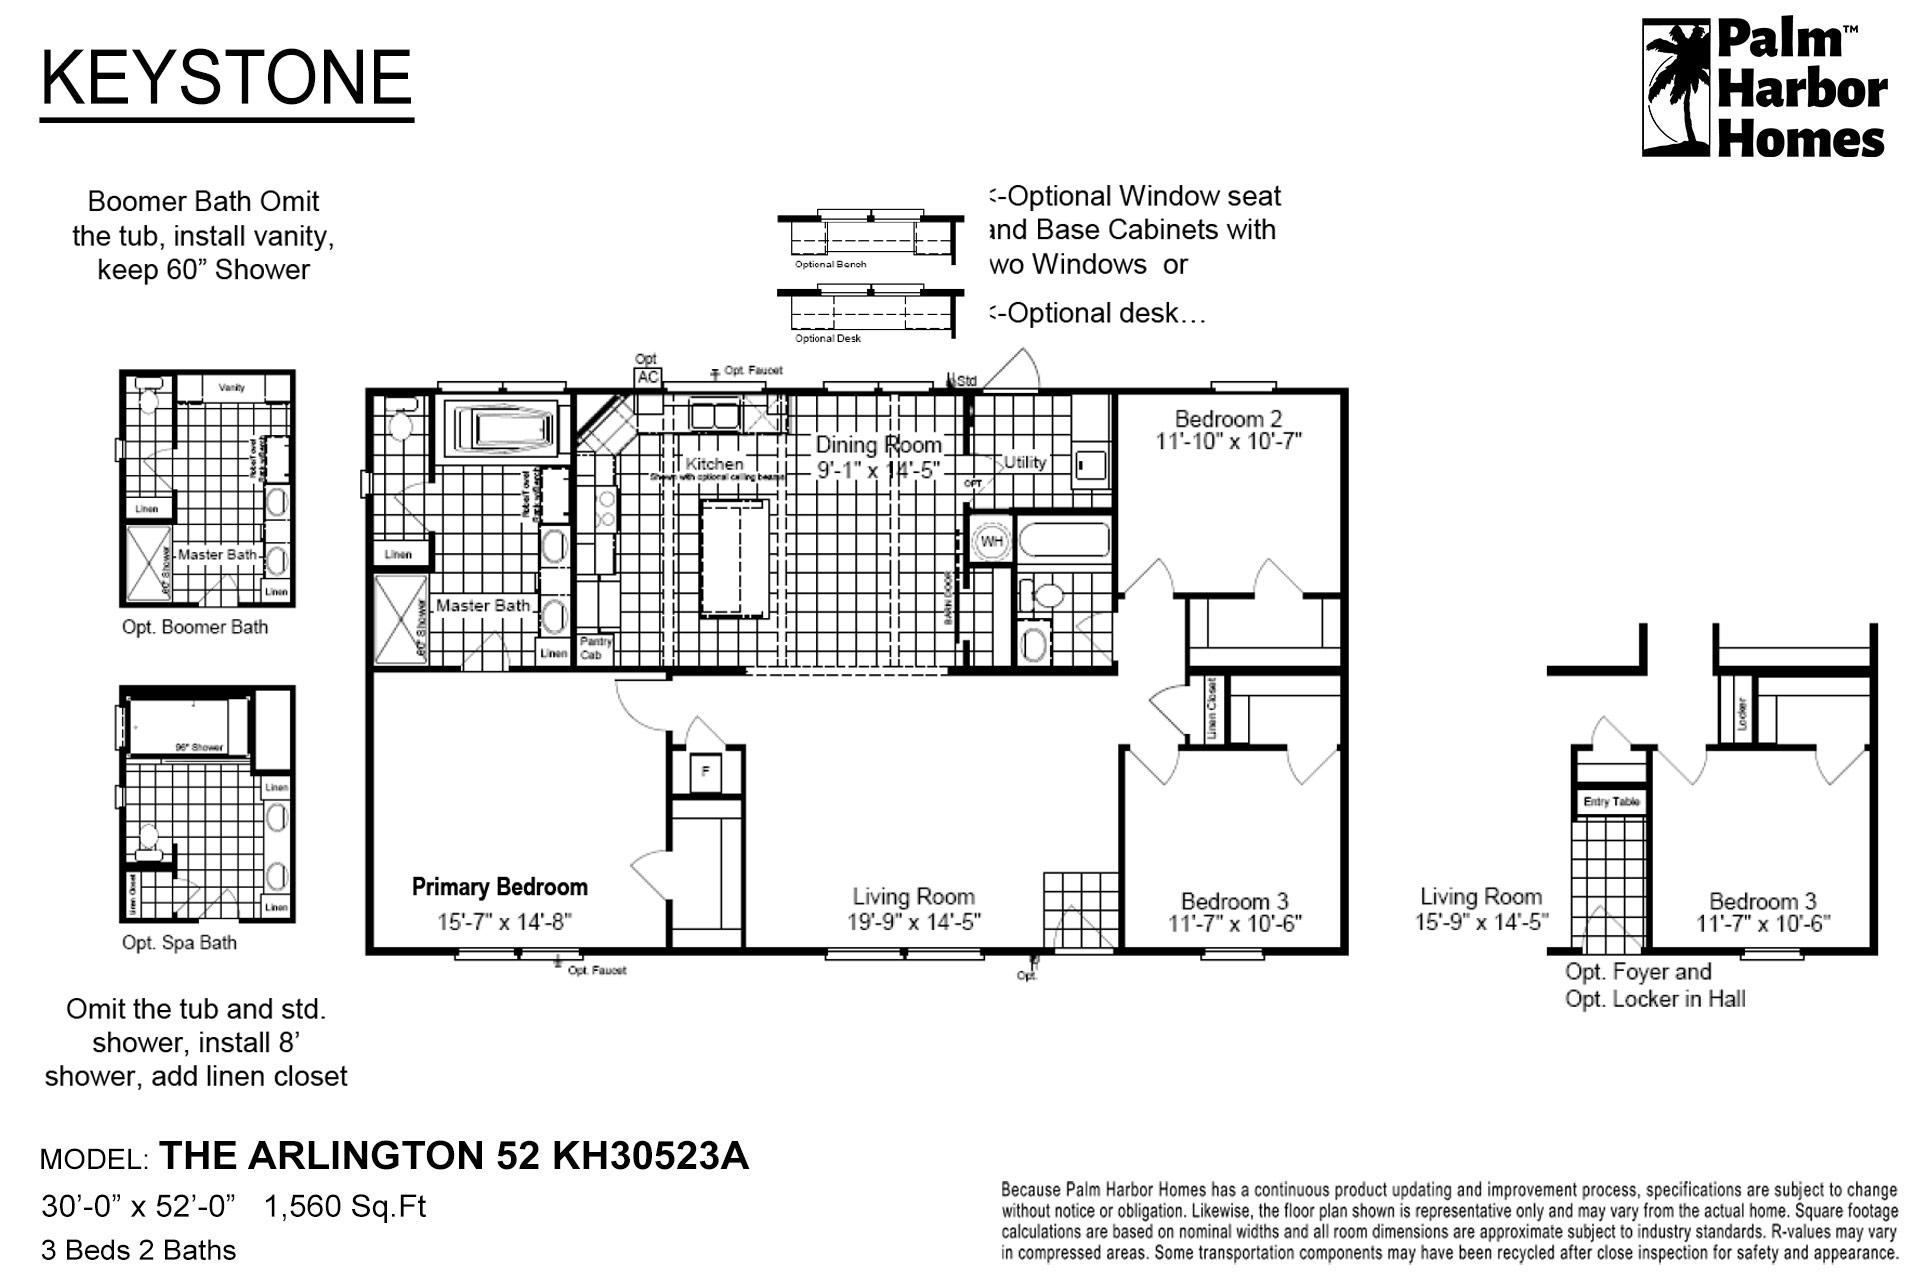 Keystone - The Arlington 52 KH30523A